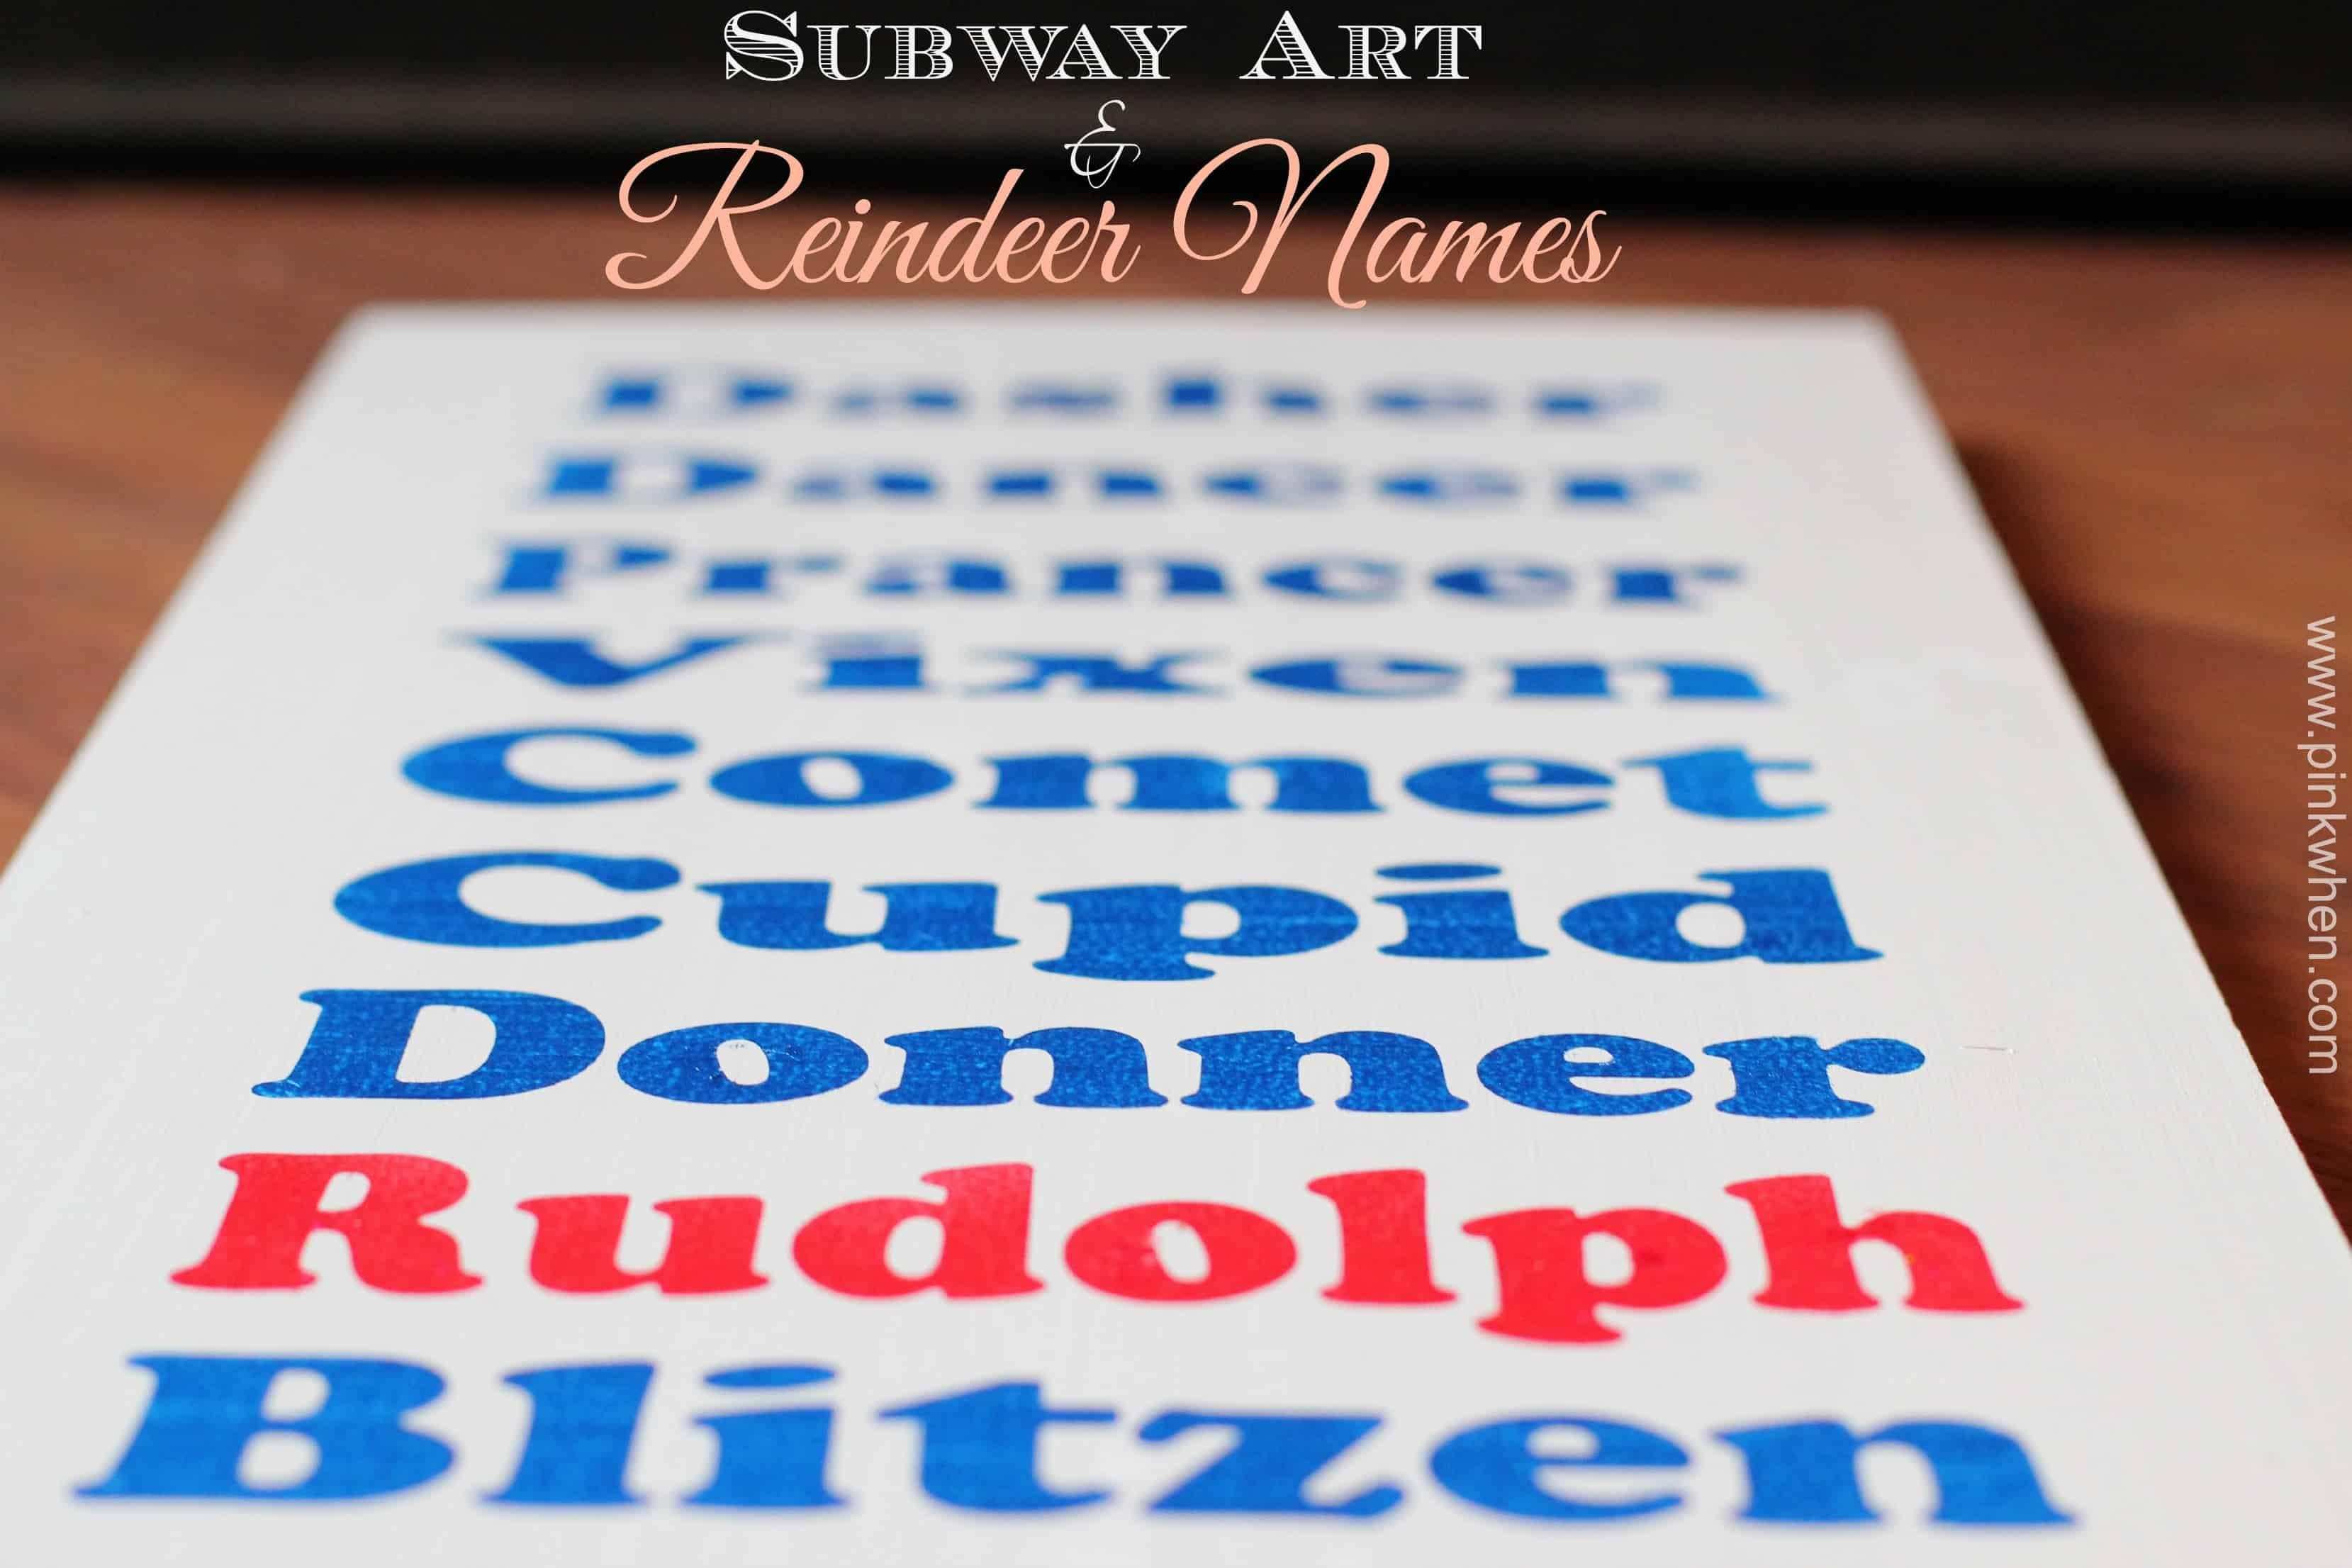 Subway Art and Reindeer Names Tutorial at PinkWhen.com